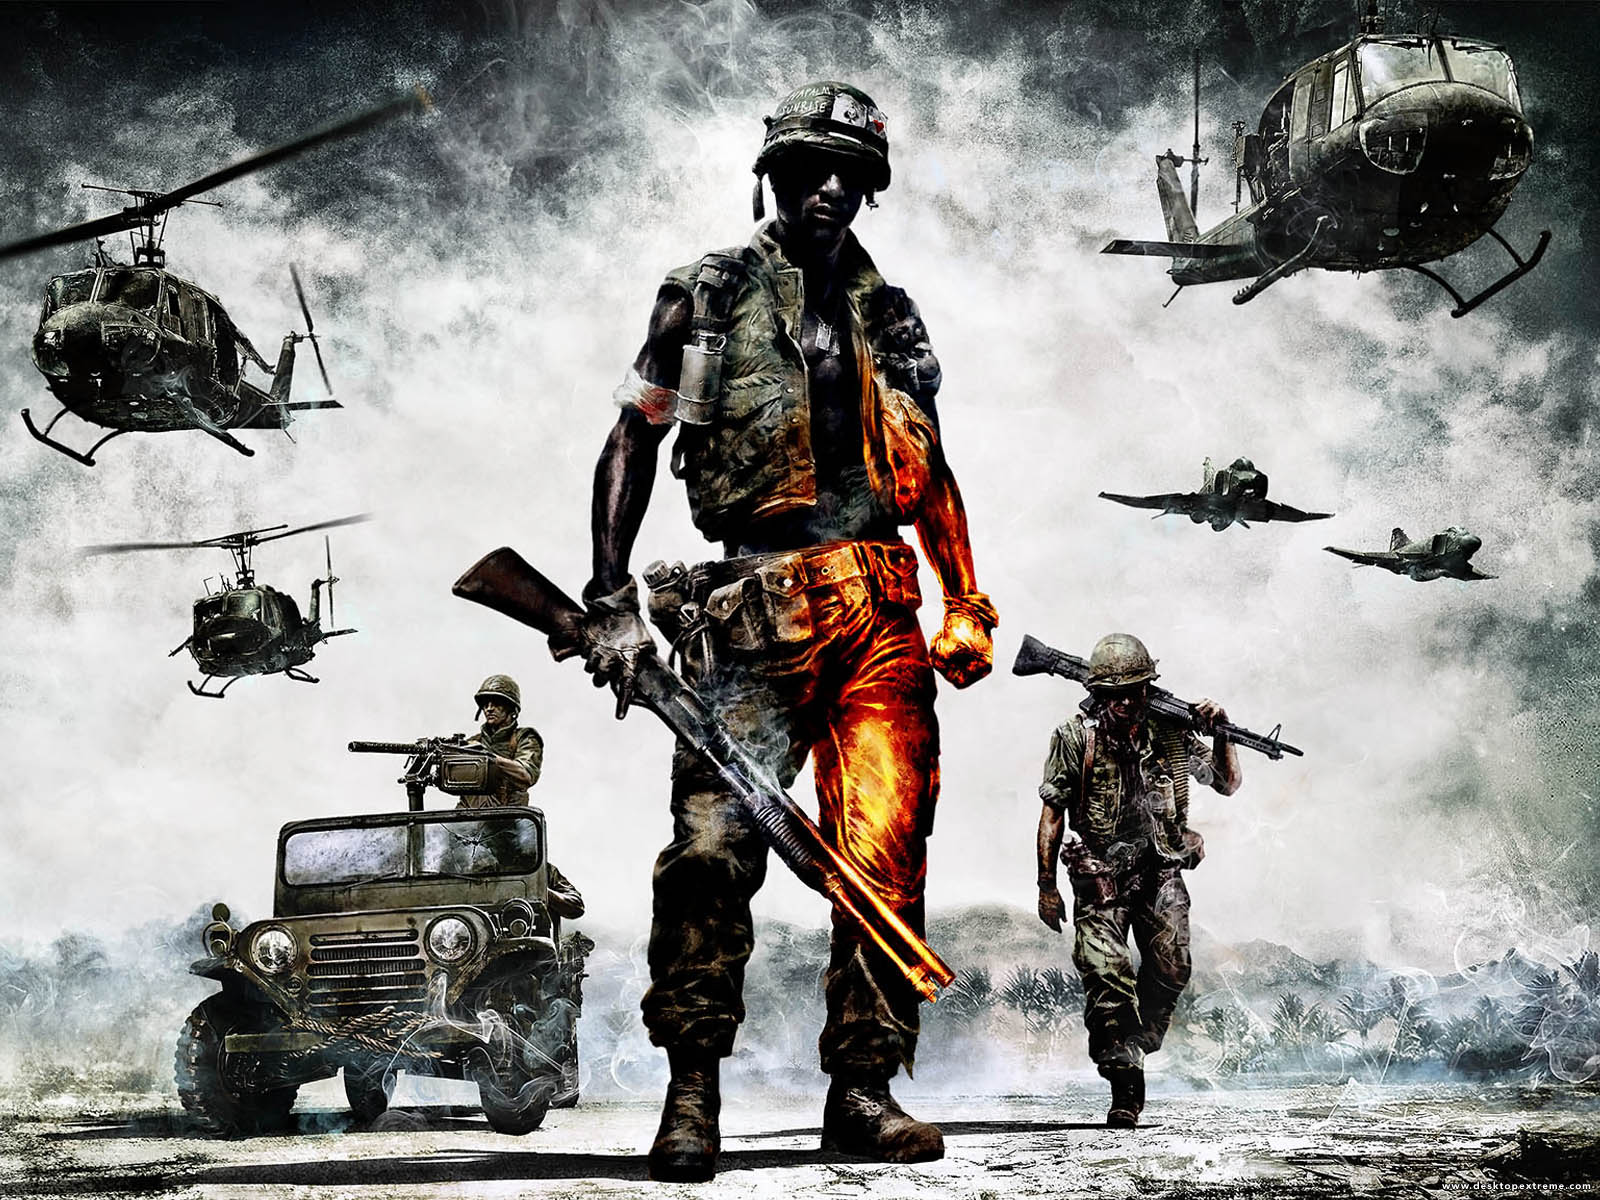 Battlefield Bad Company   Vietnam Wallpaper by DesktopExtremecom 1600x1200